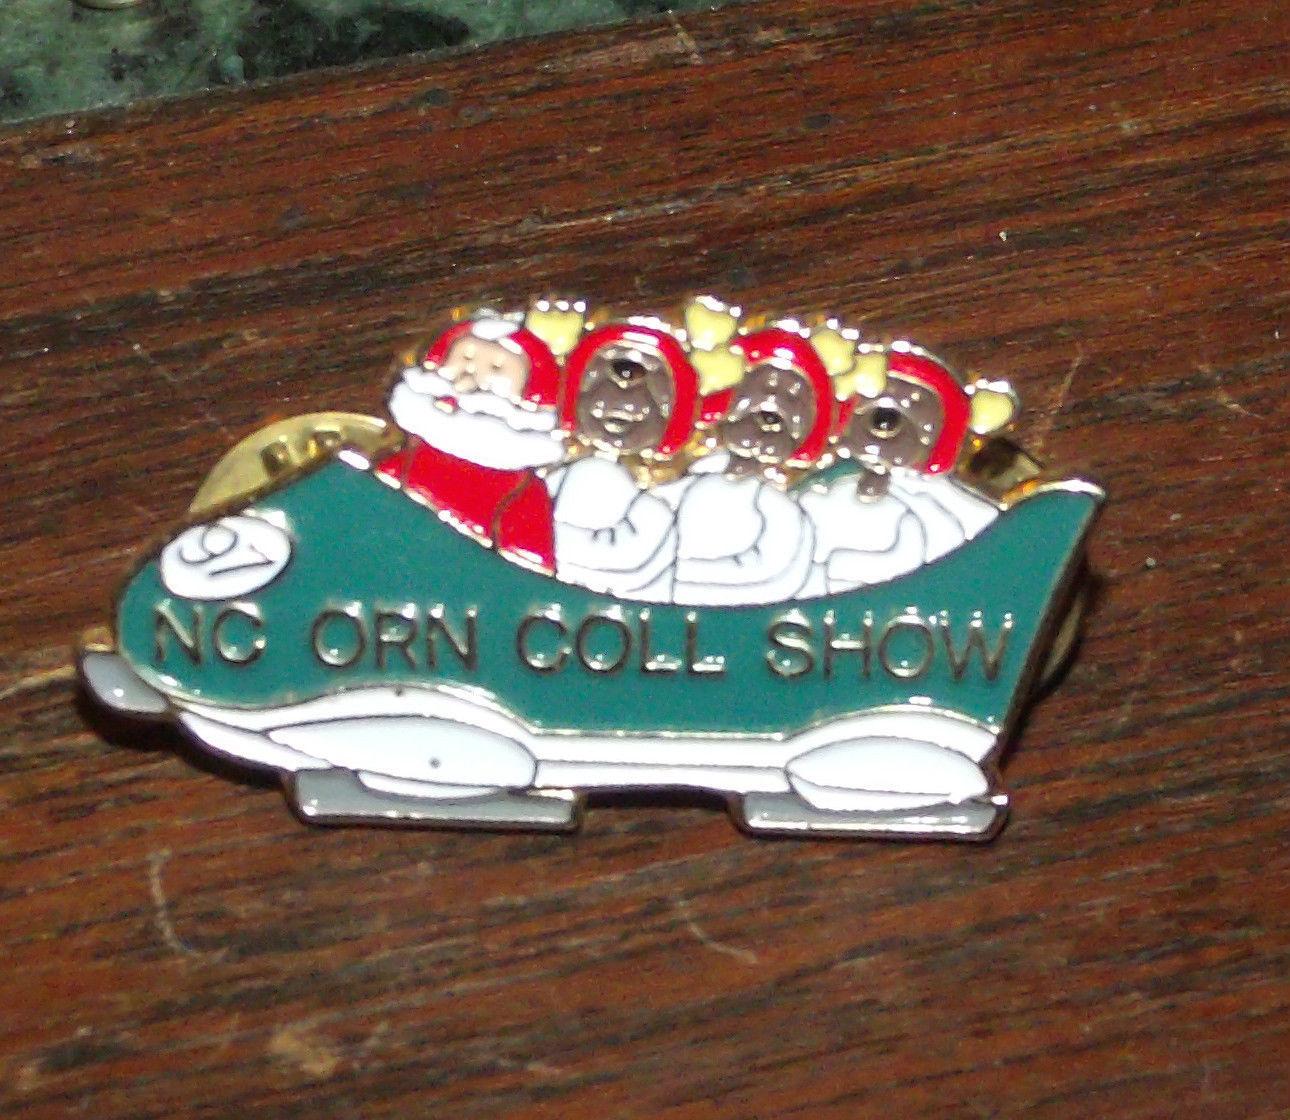 1997 NORTH CAROLINA ORNAMENT COLLECTIBLE SHOW LAPEL PIN